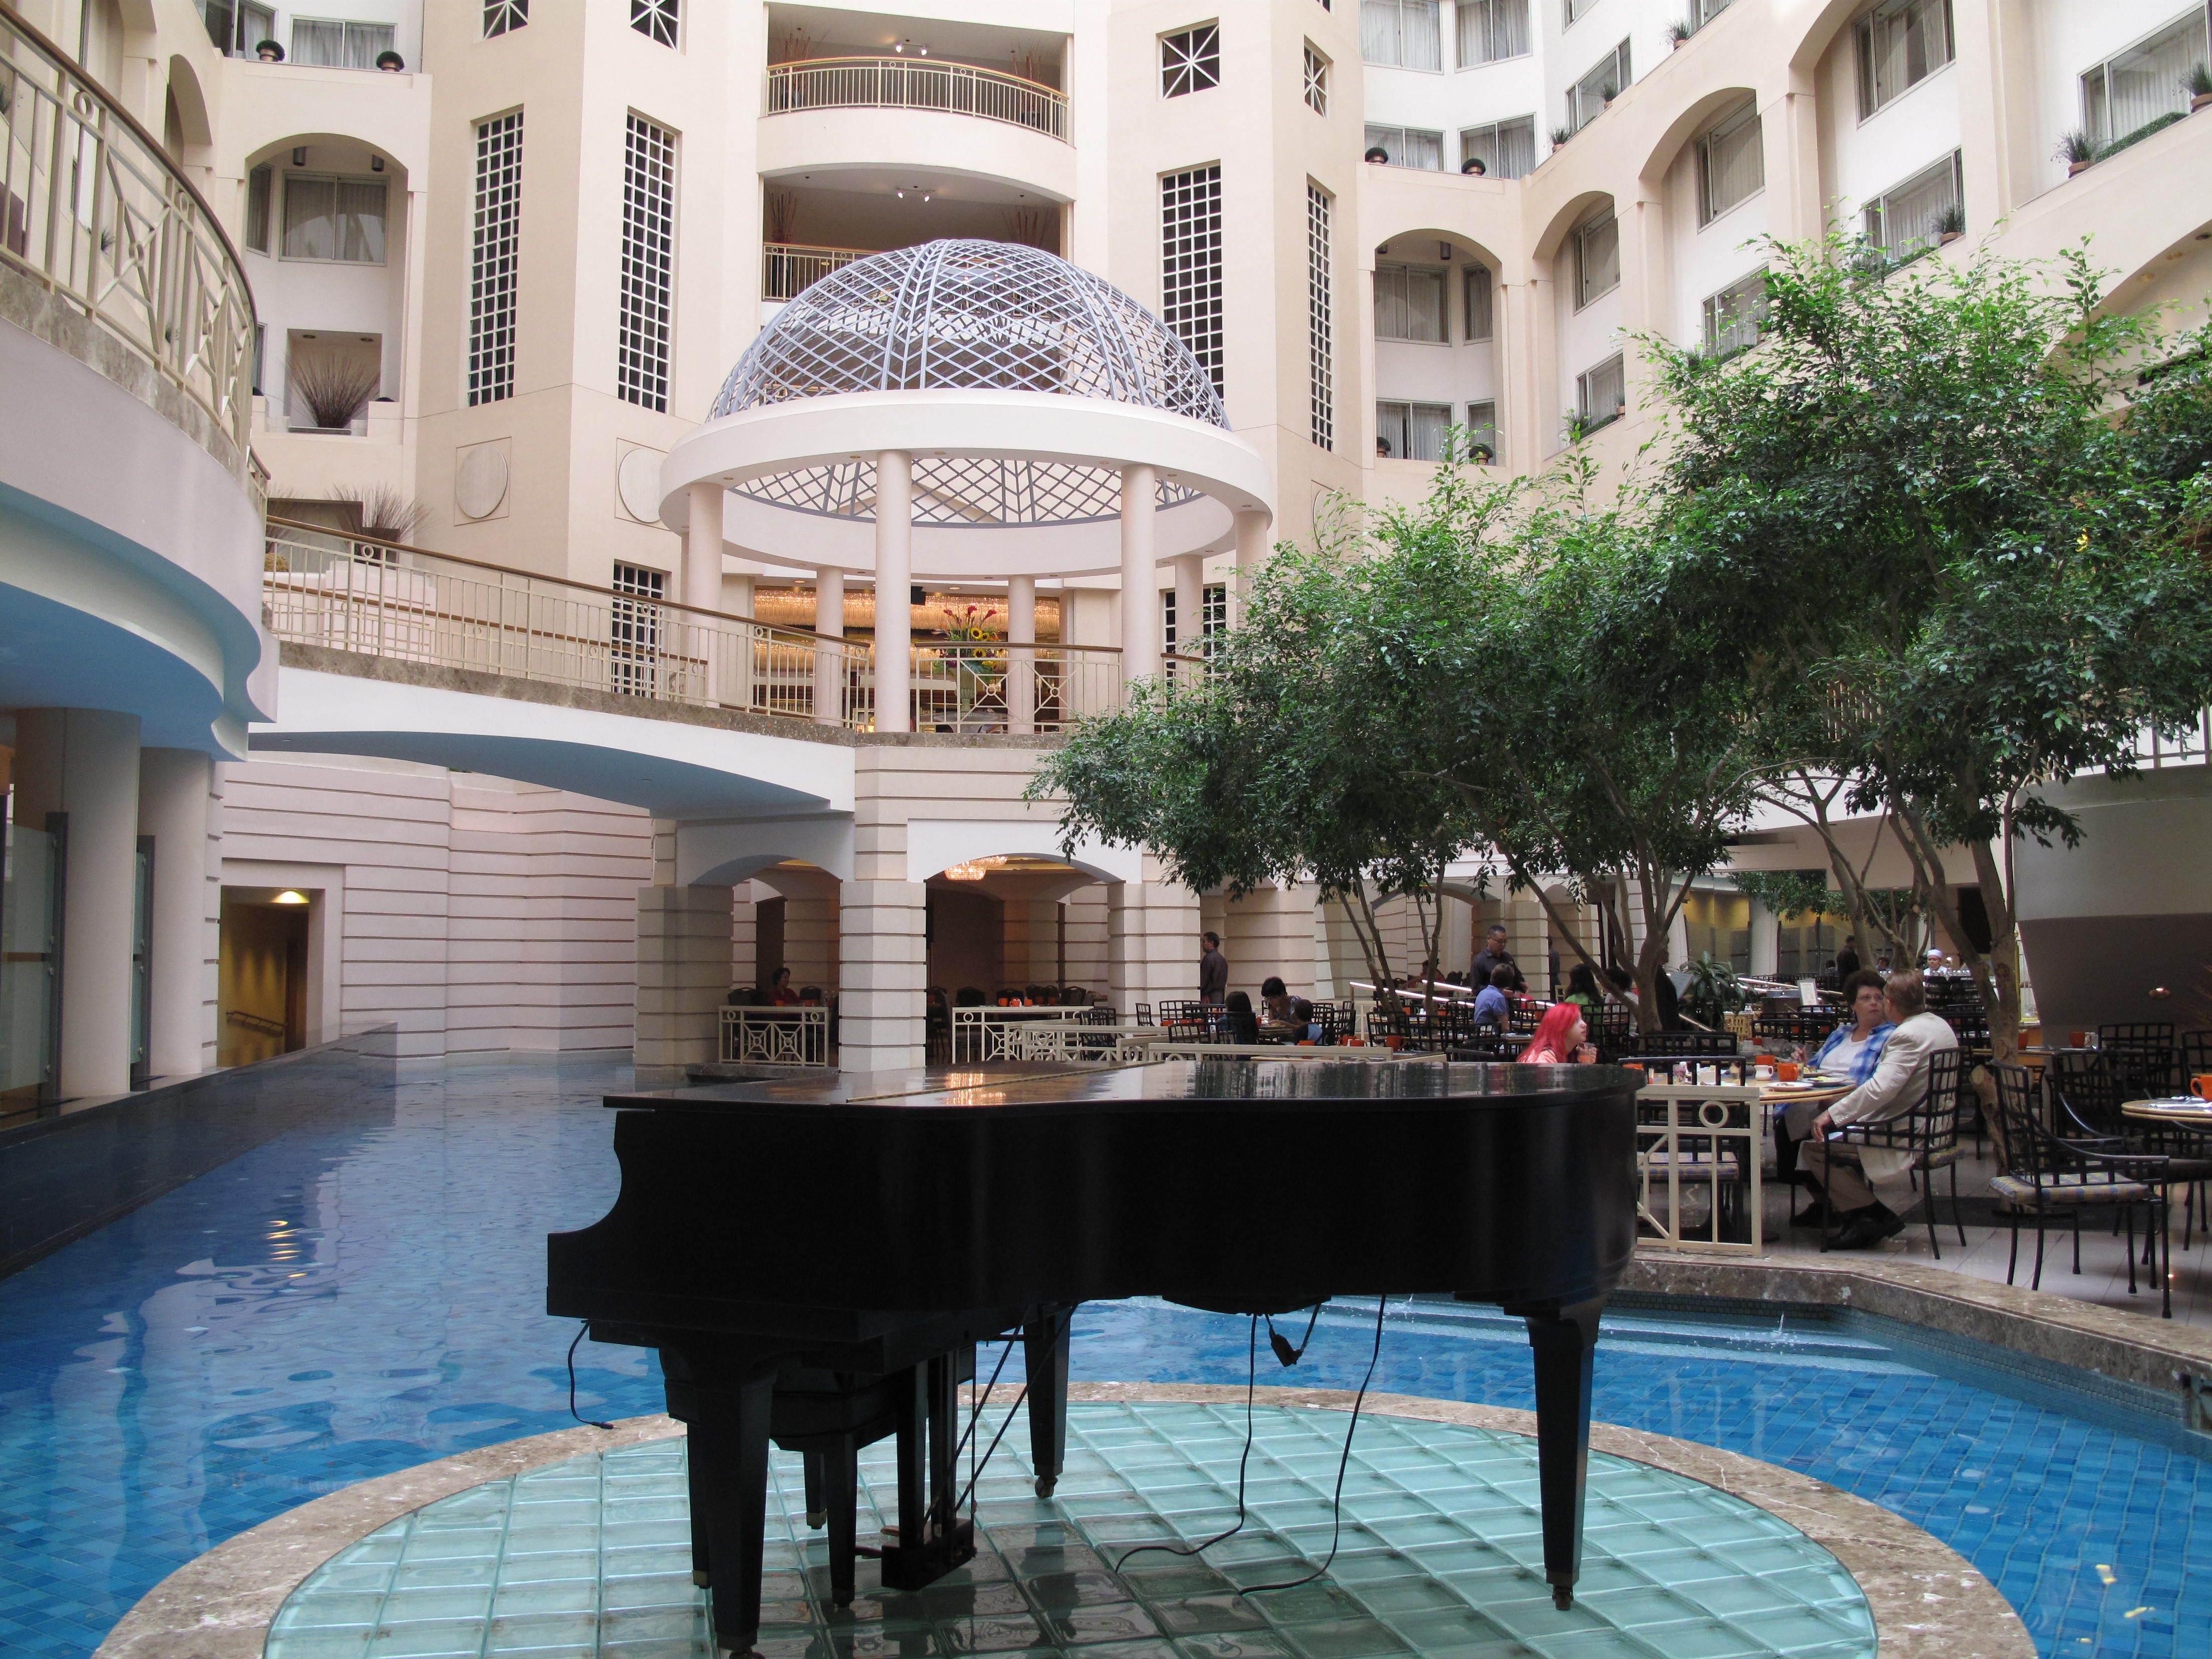 The Grand Hyatt Hotel Washington Dc With Images Pictures Of Washington Dc Washington Dc City Hyatt Hotels